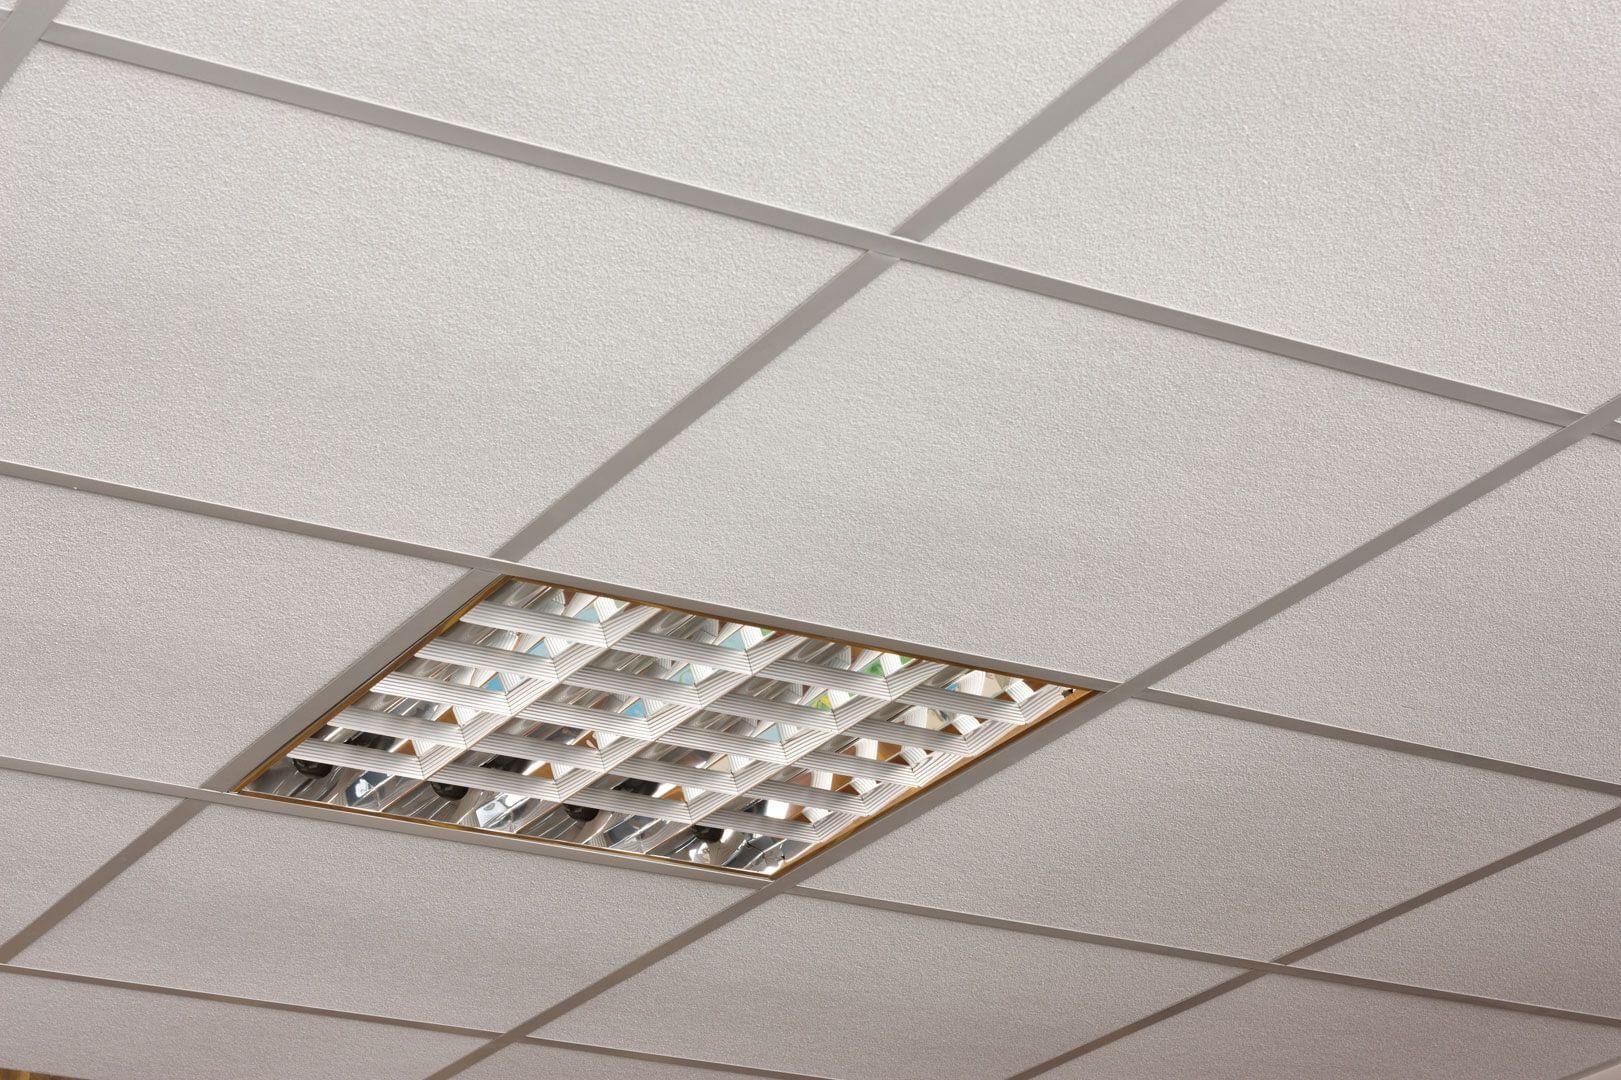 Imperial Ceiling Tile Sizes Httpcreativechairsandtables